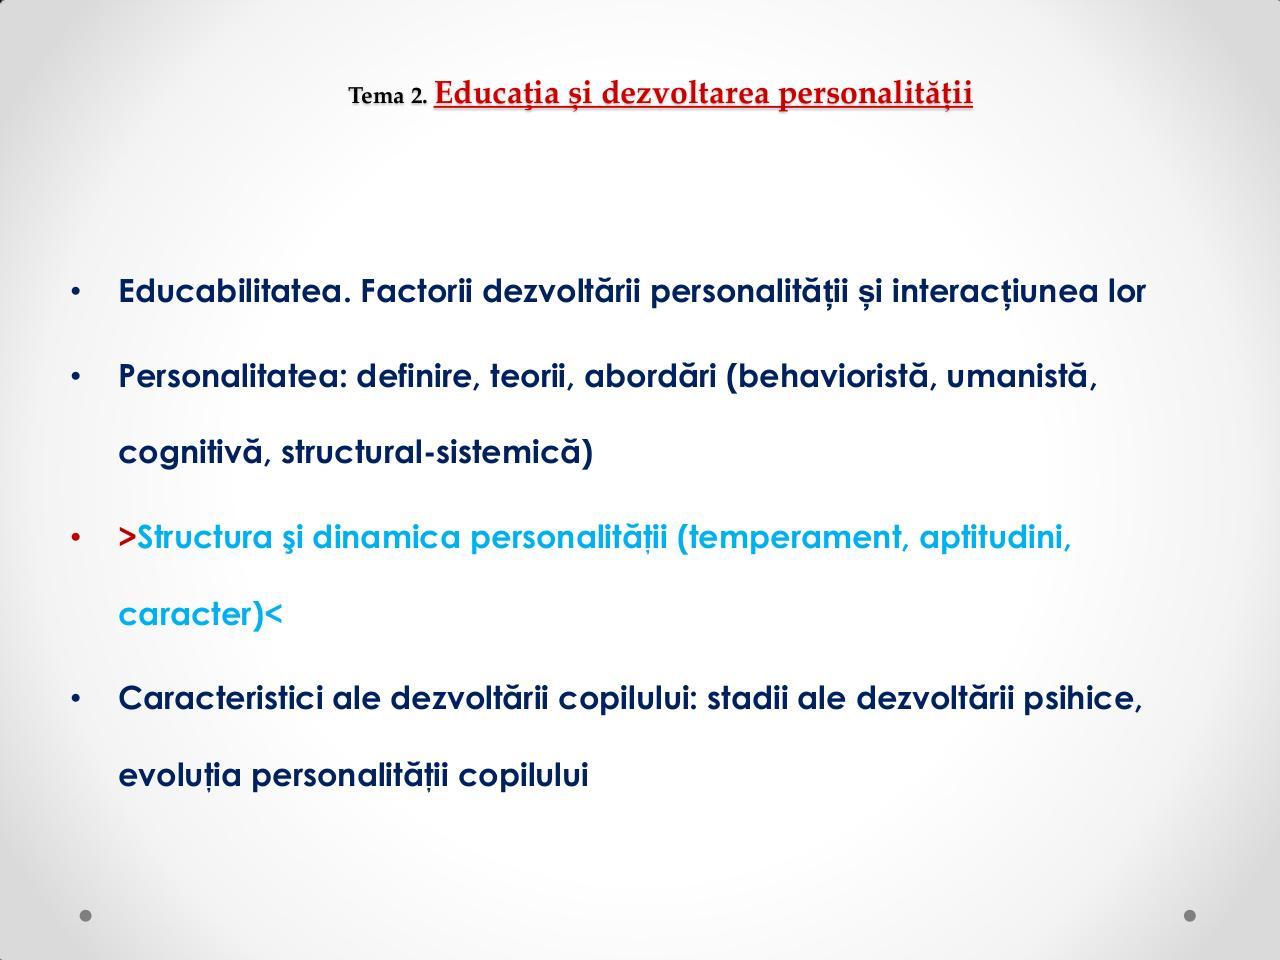 Structura personalitatii